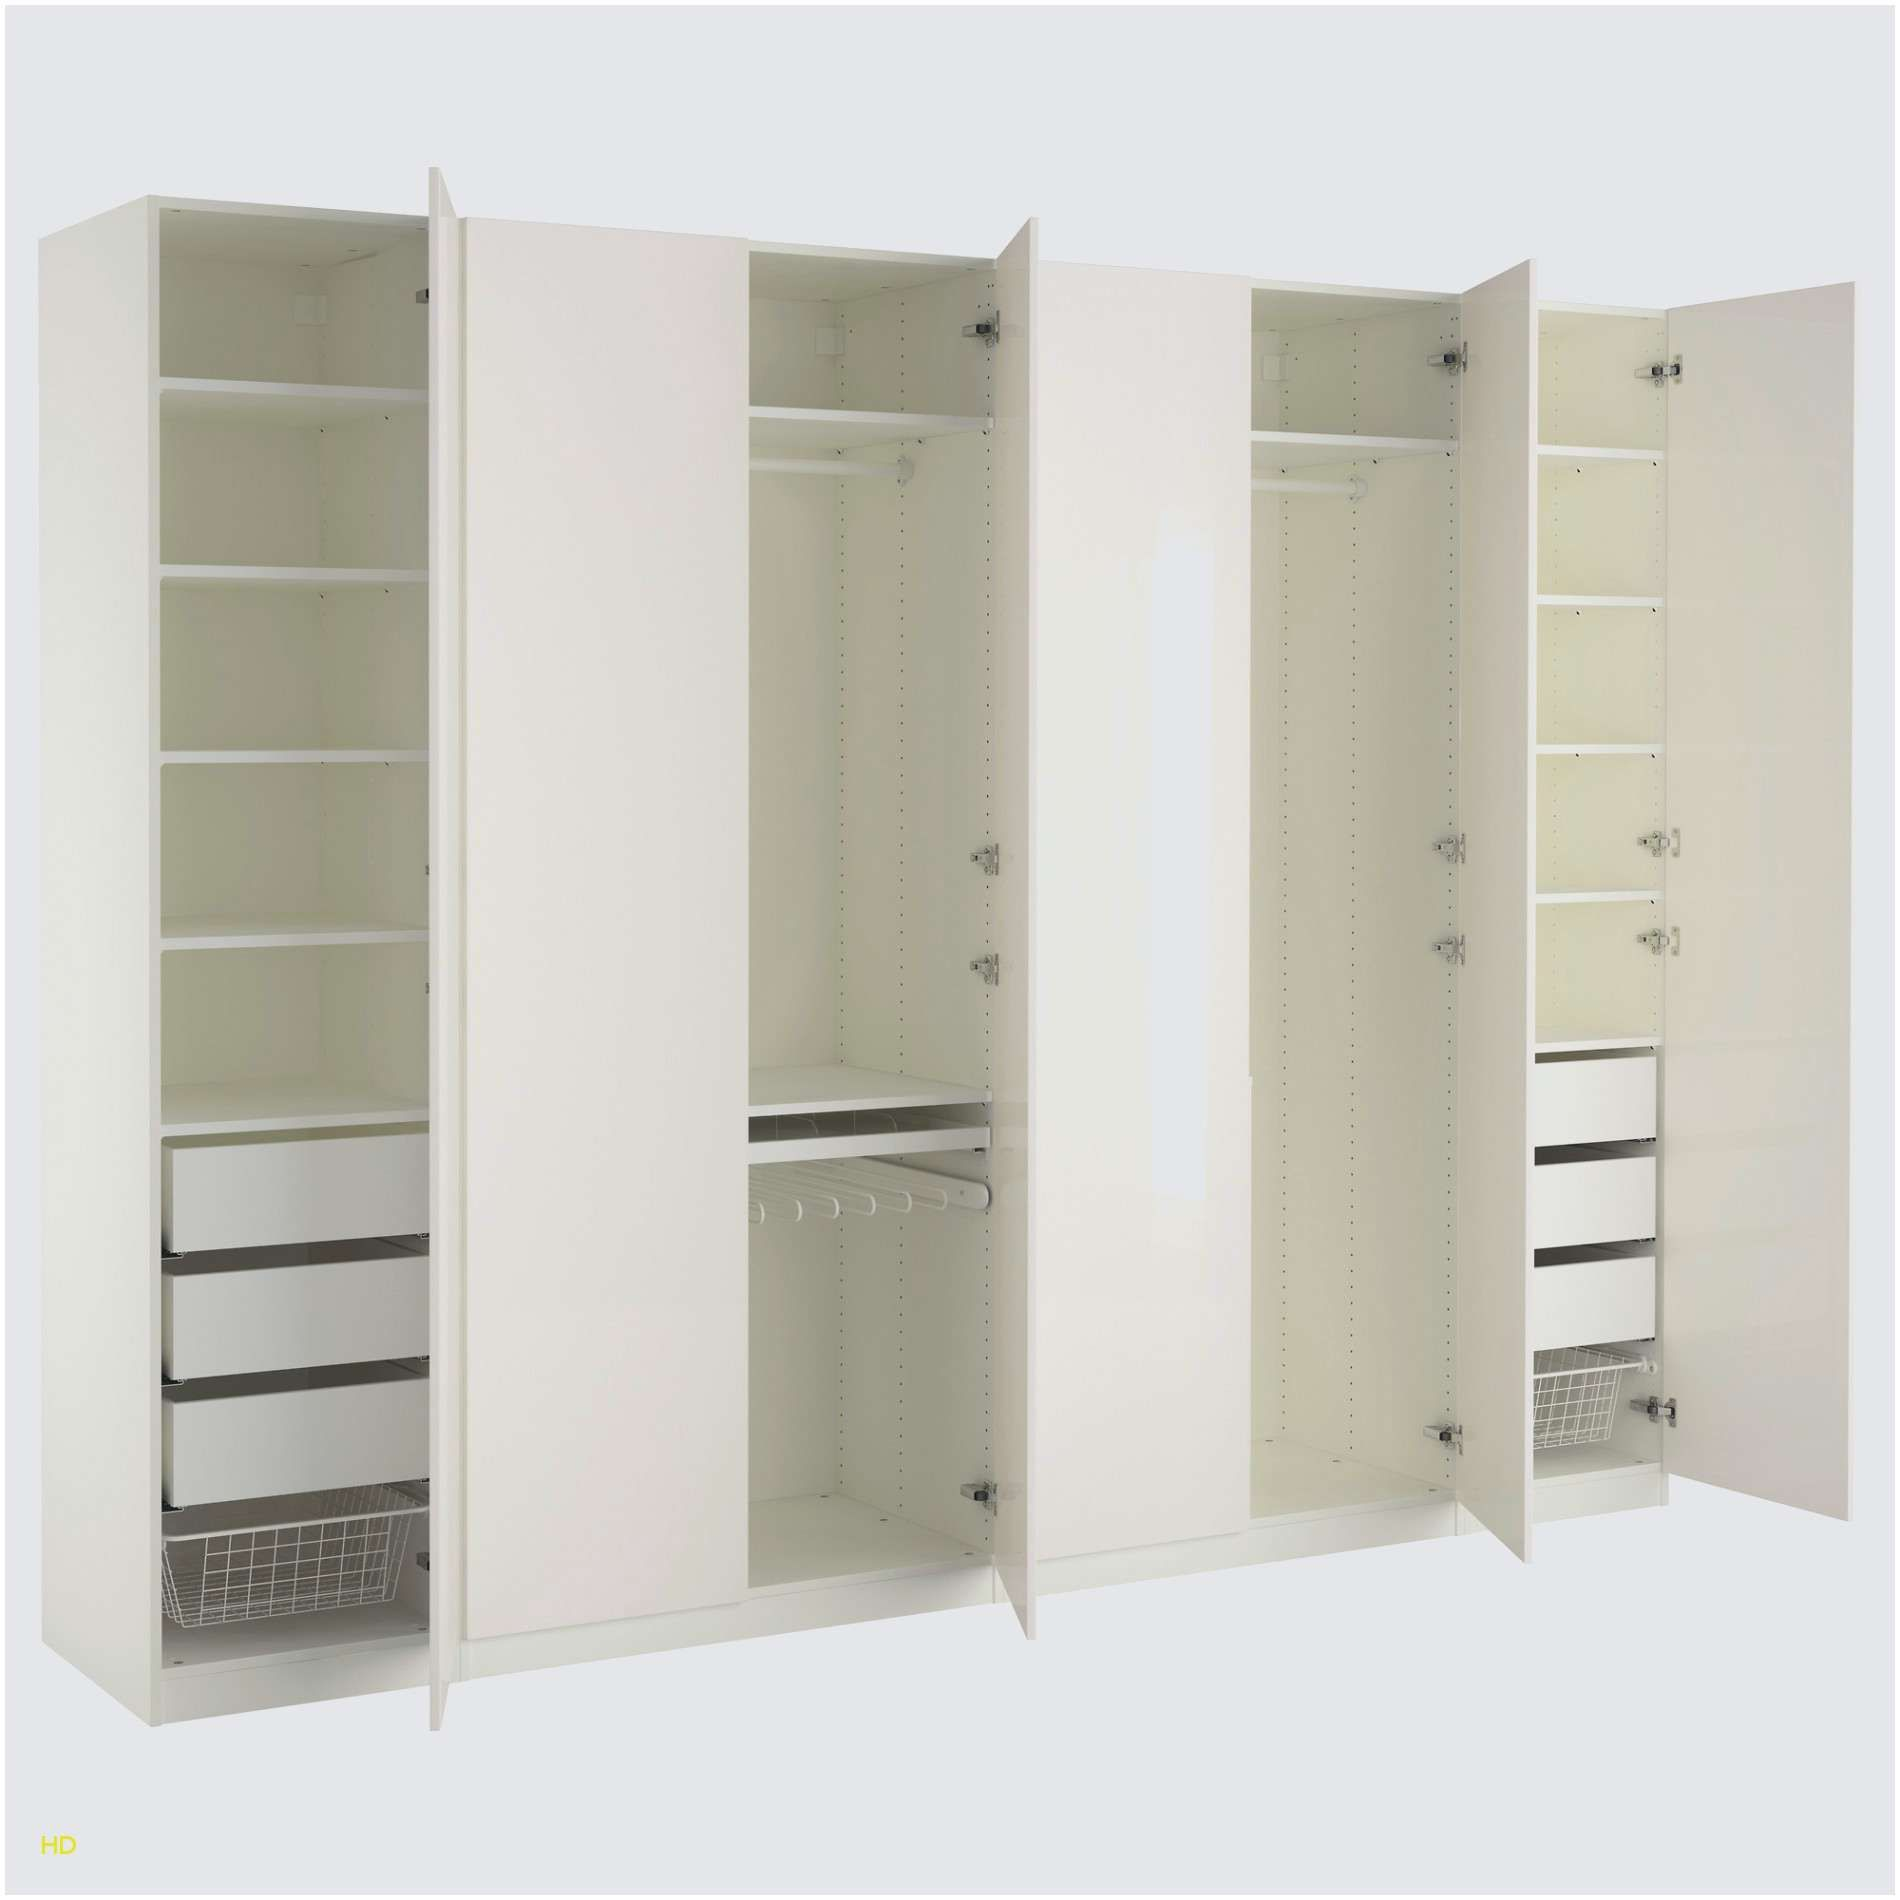 Armoire D Angle Dressing pinketty corp on idées de meubles | locker storage